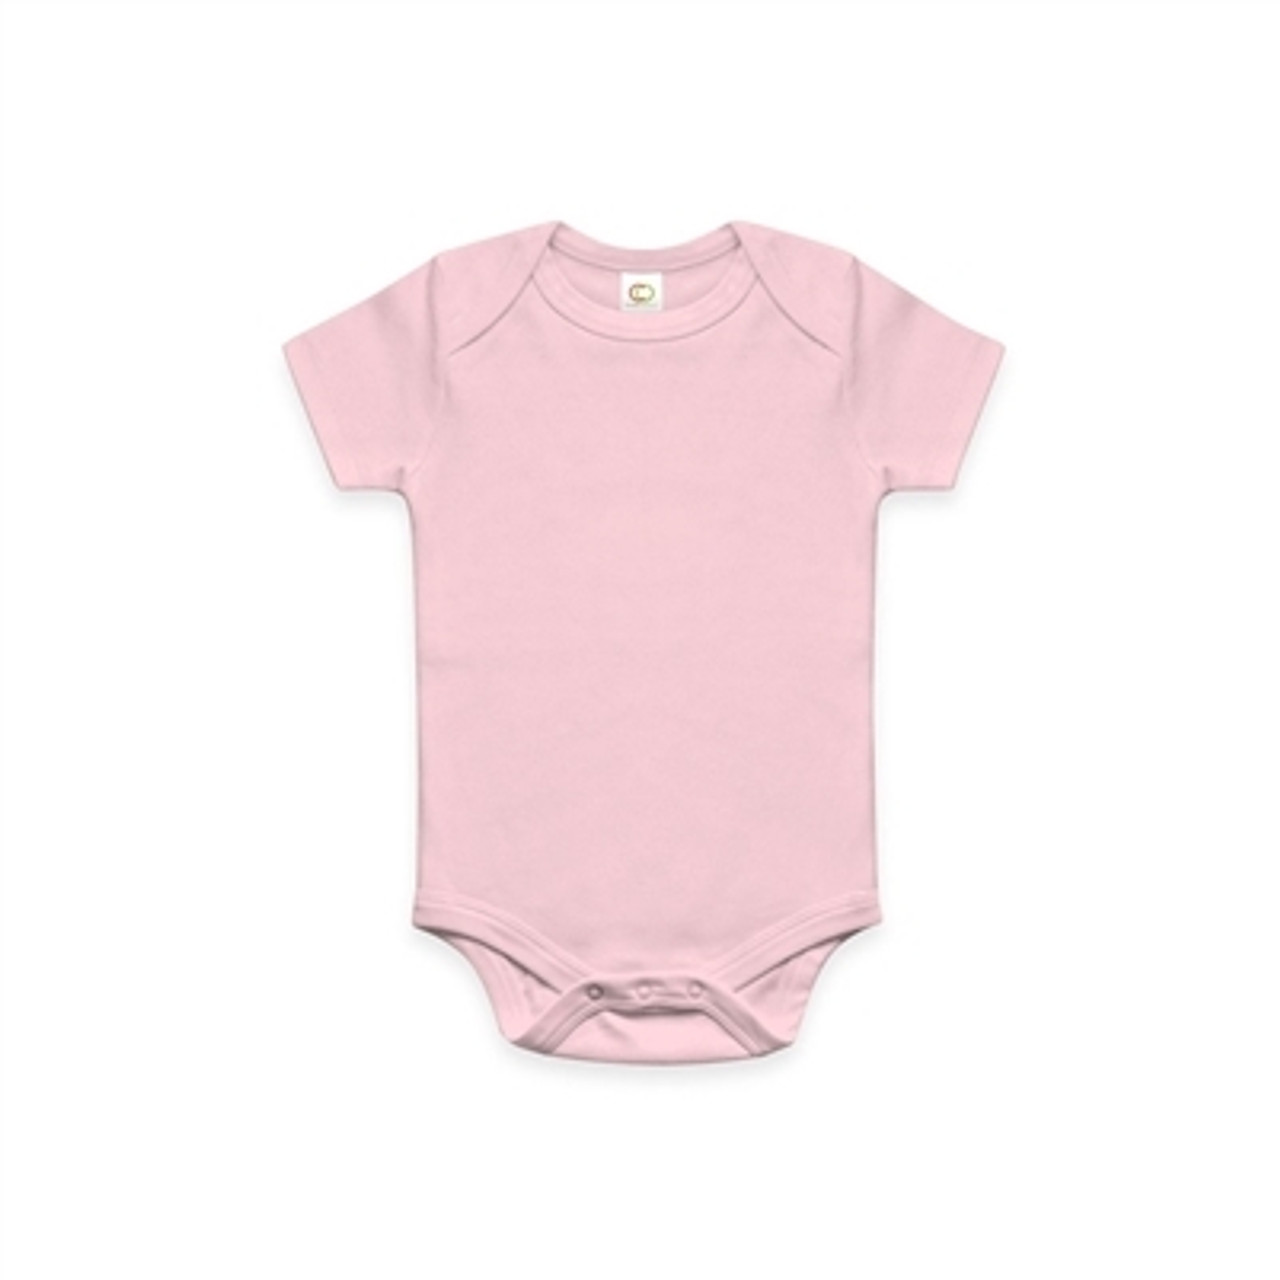 Organic Baby Bodysuit - 6-12 months - Blossom